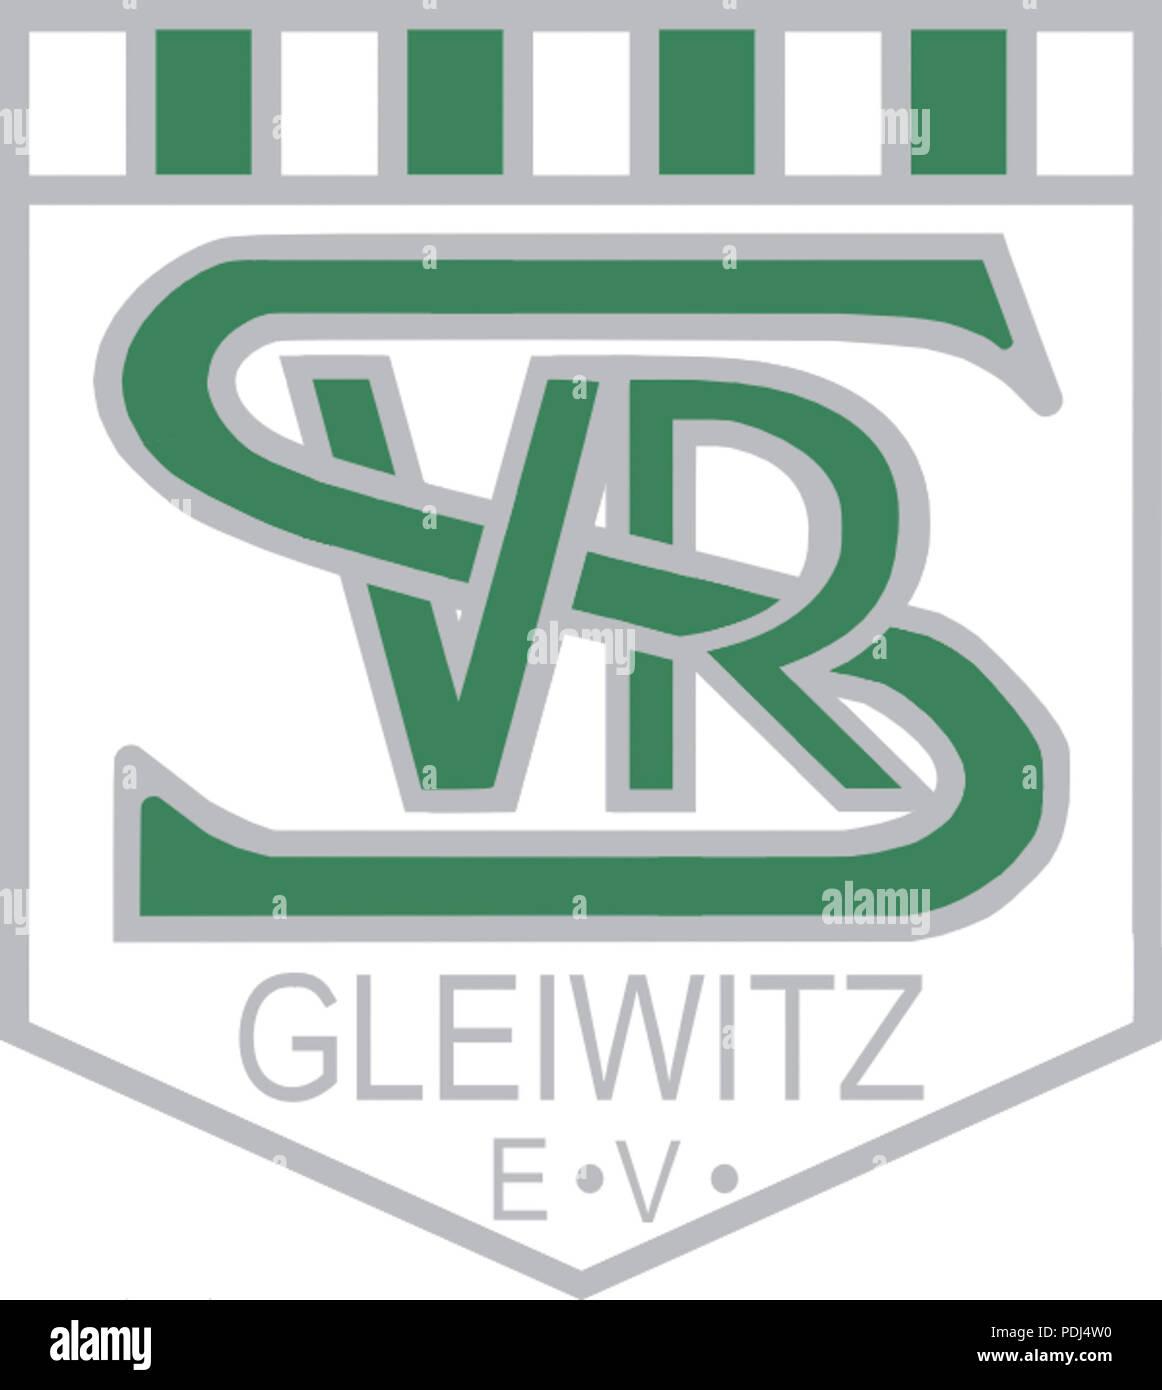 372 Vorwärts-Rasensport Gleiwitz Stock Photo